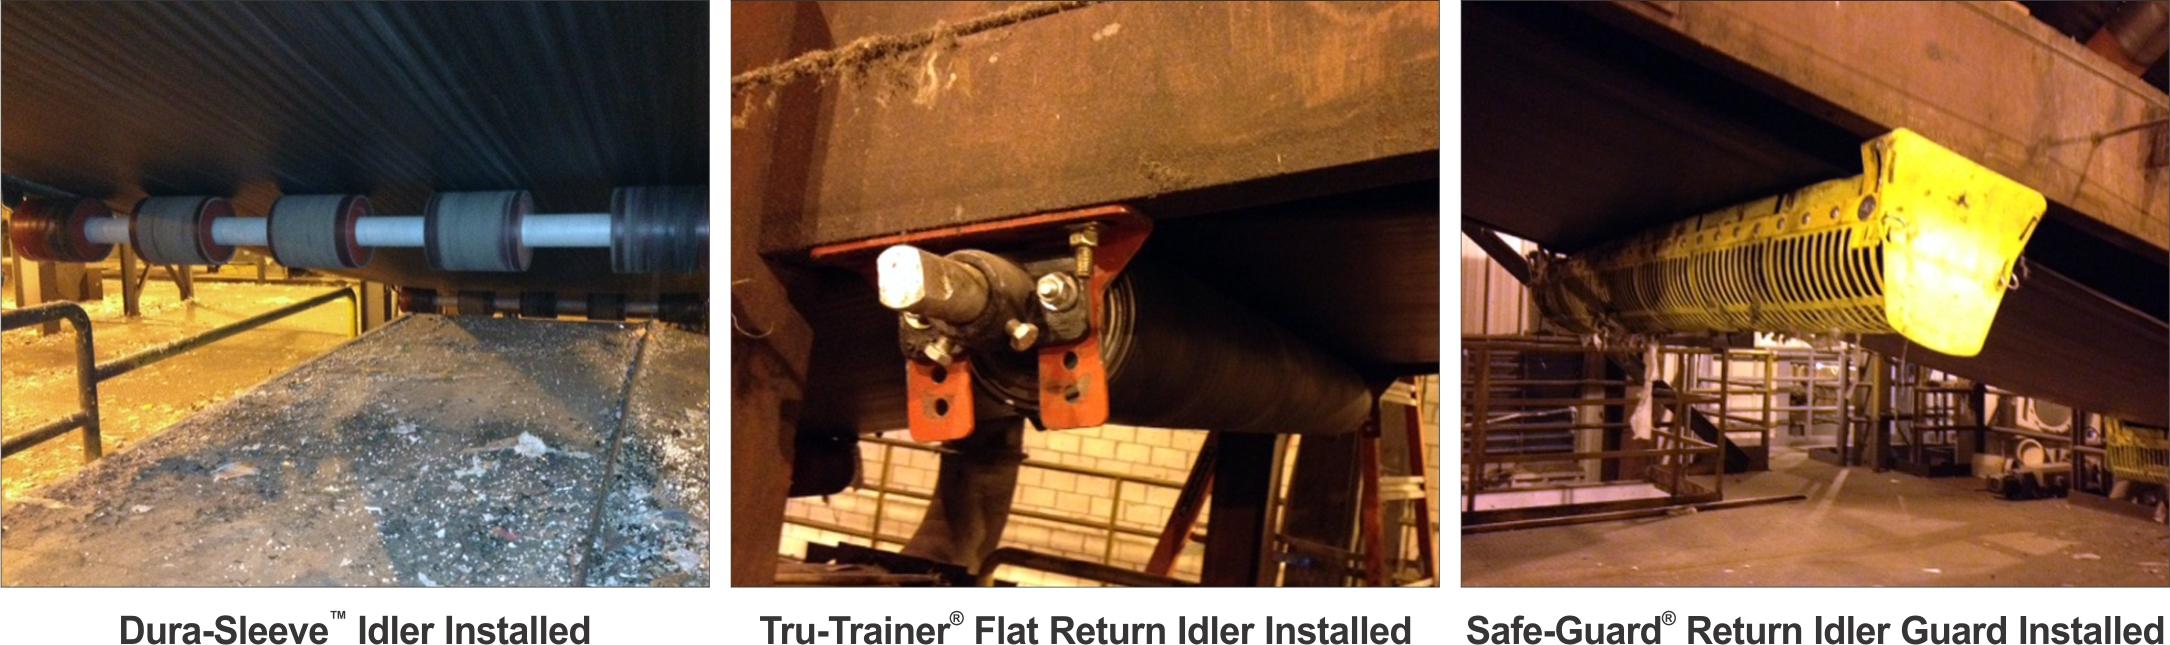 Waste to Energy Facility_Flat Return Tru-Trainer & Dura-Sleeve Case Study - EG